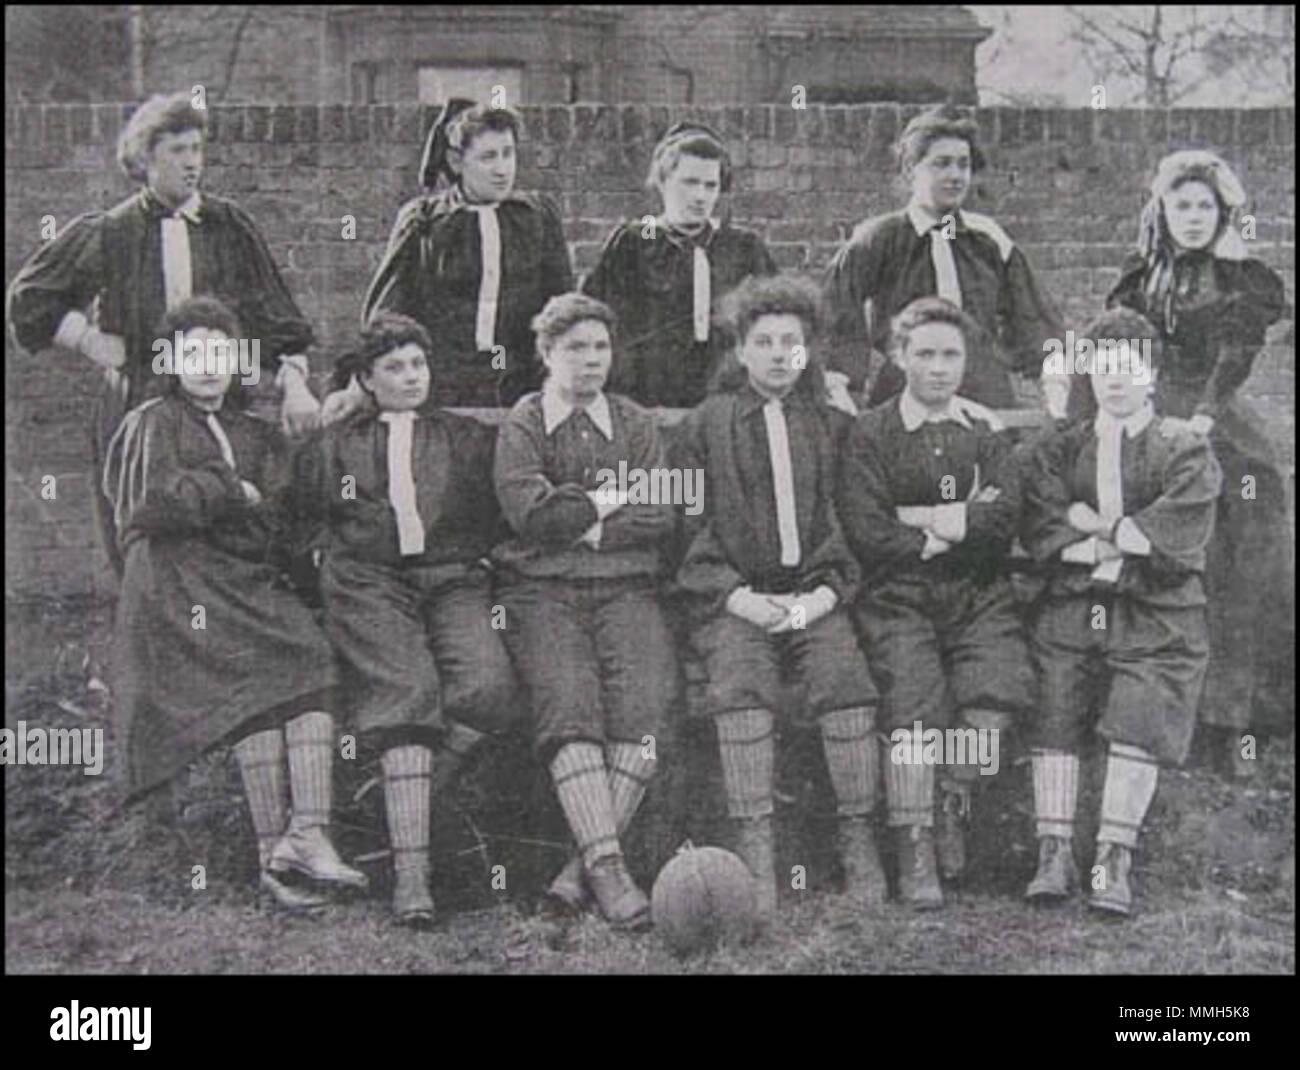 . L'équipe de North London, le 23 mars 1895. Debout: Lily Lynn, Nettie Honeyball, Williams, Edwards, Ide. Assises: Compton, F. B. Fenn, Nellie Gilbert, P. Smith, Rosa Thiere, Biggs.  . 1895. Unknown 98 British Ladies Football Club - Stock Image